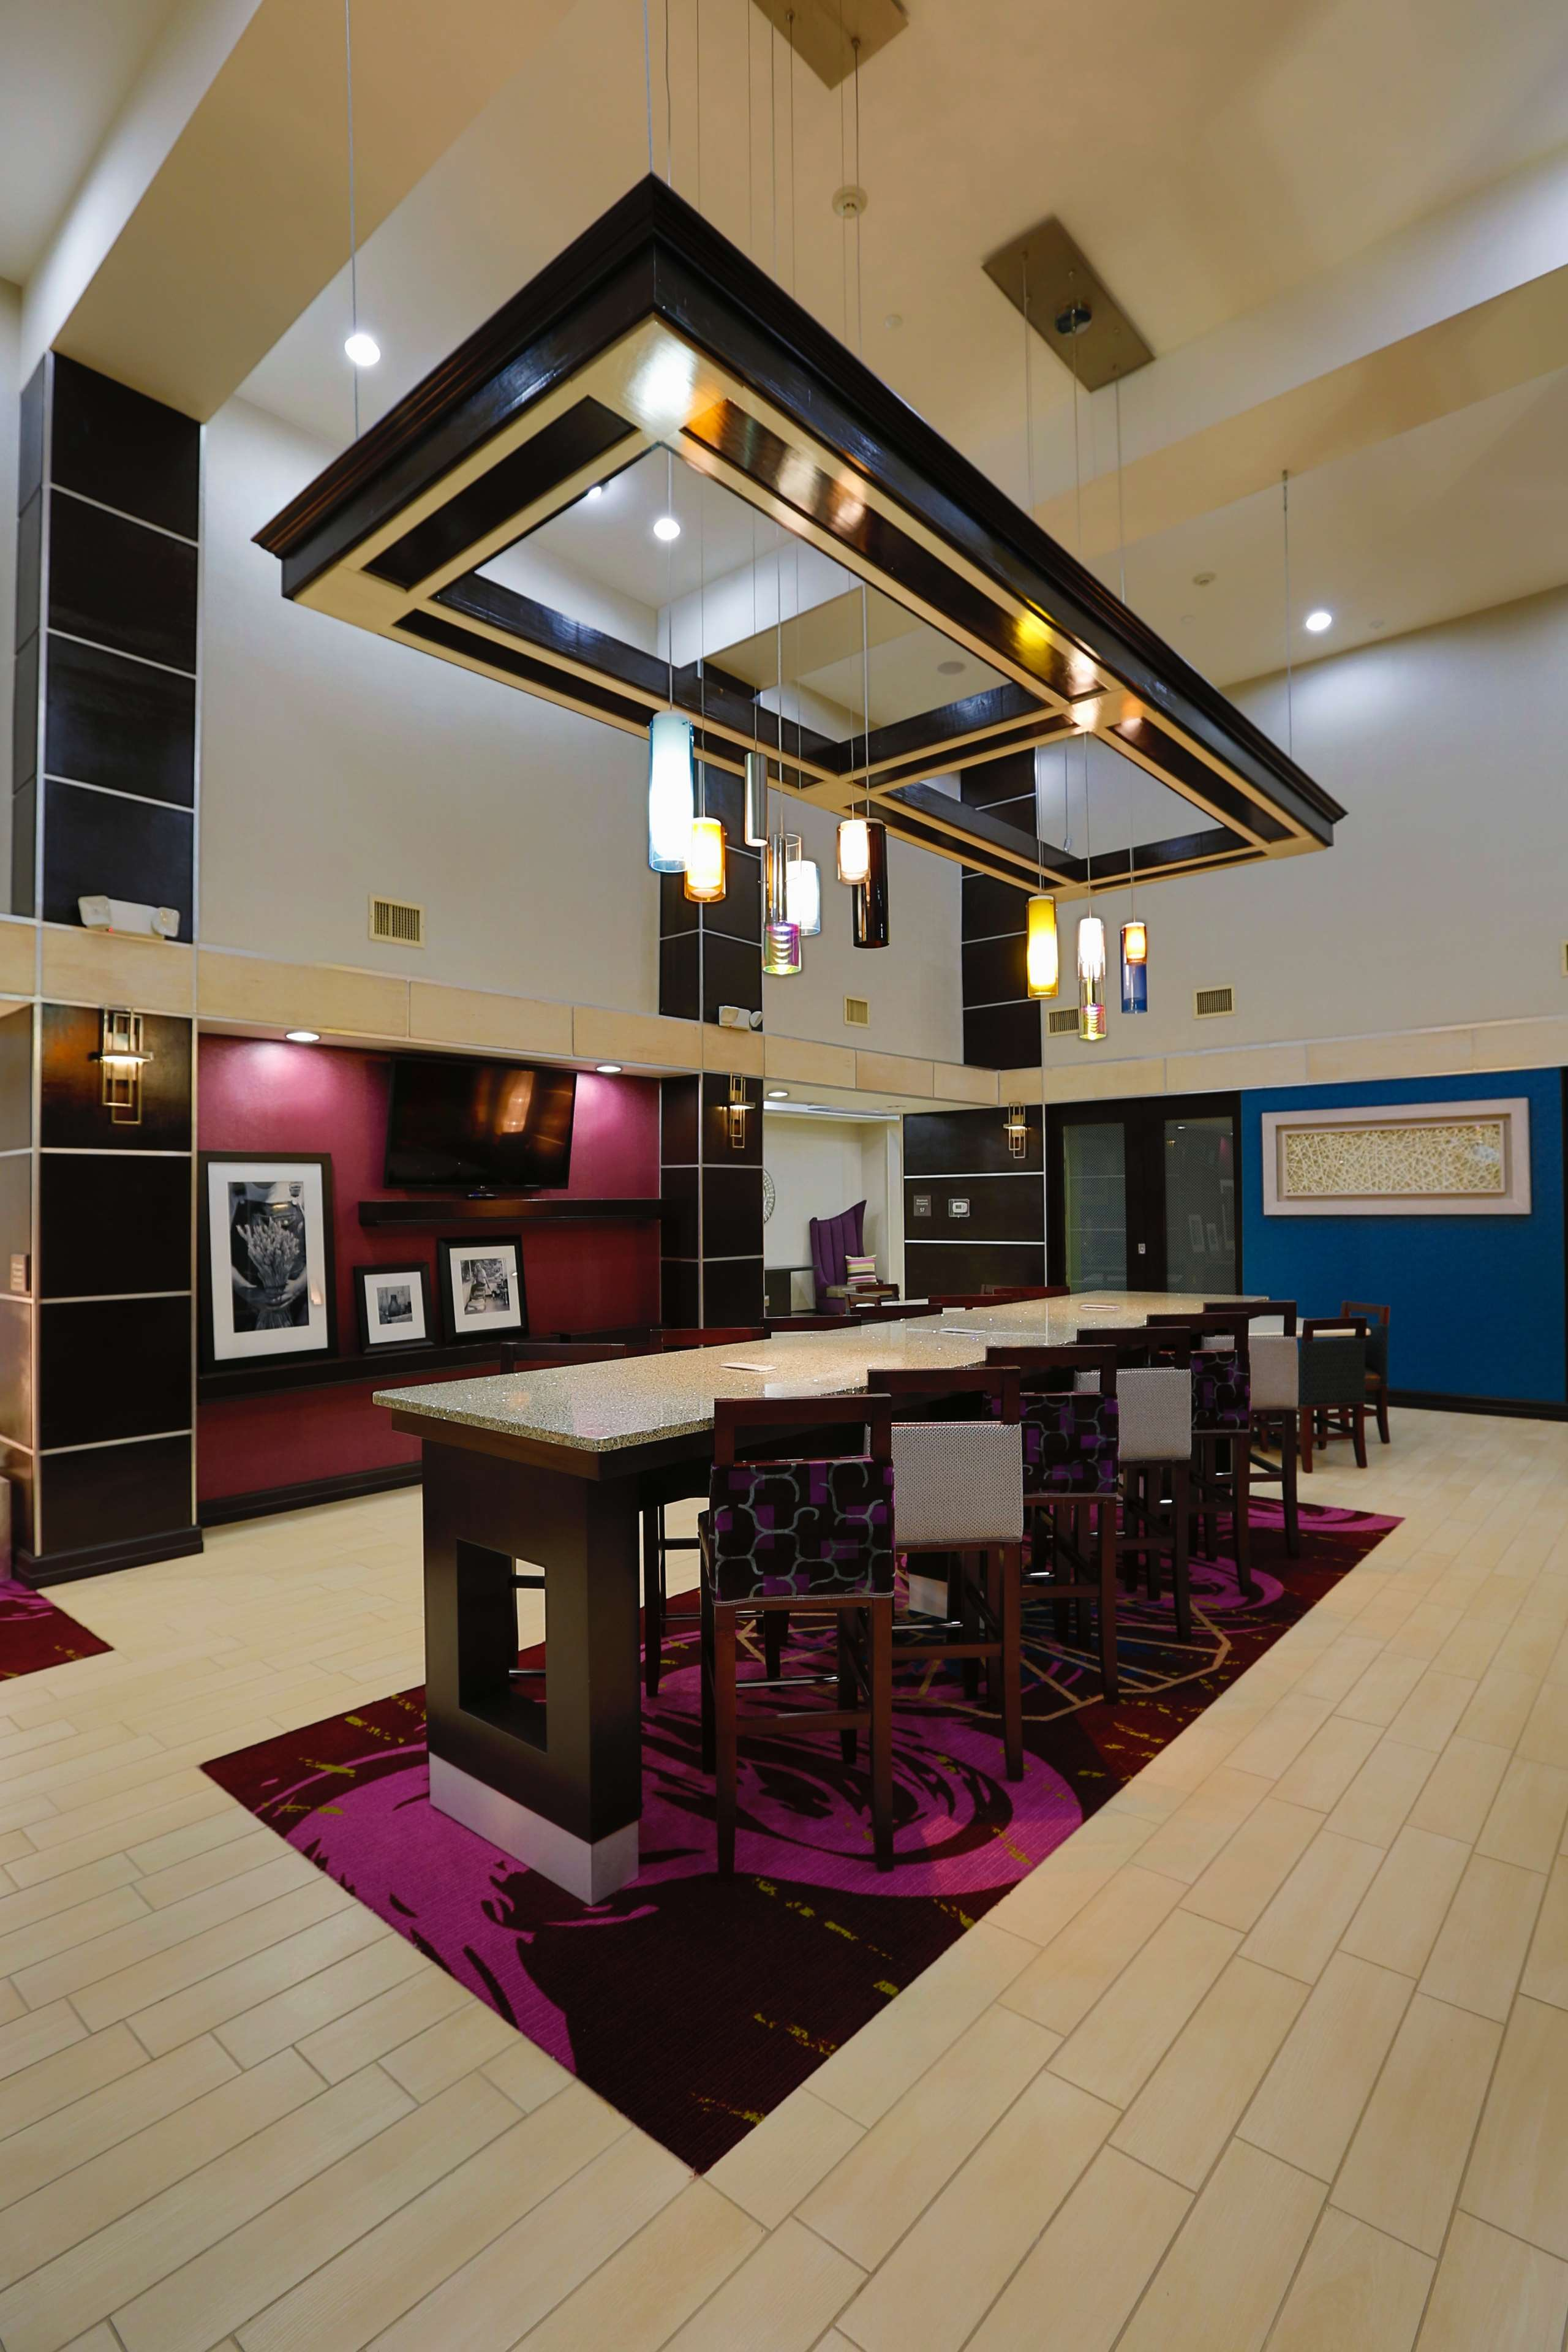 Hampton Inn & Suites Missouri City, TX image 3